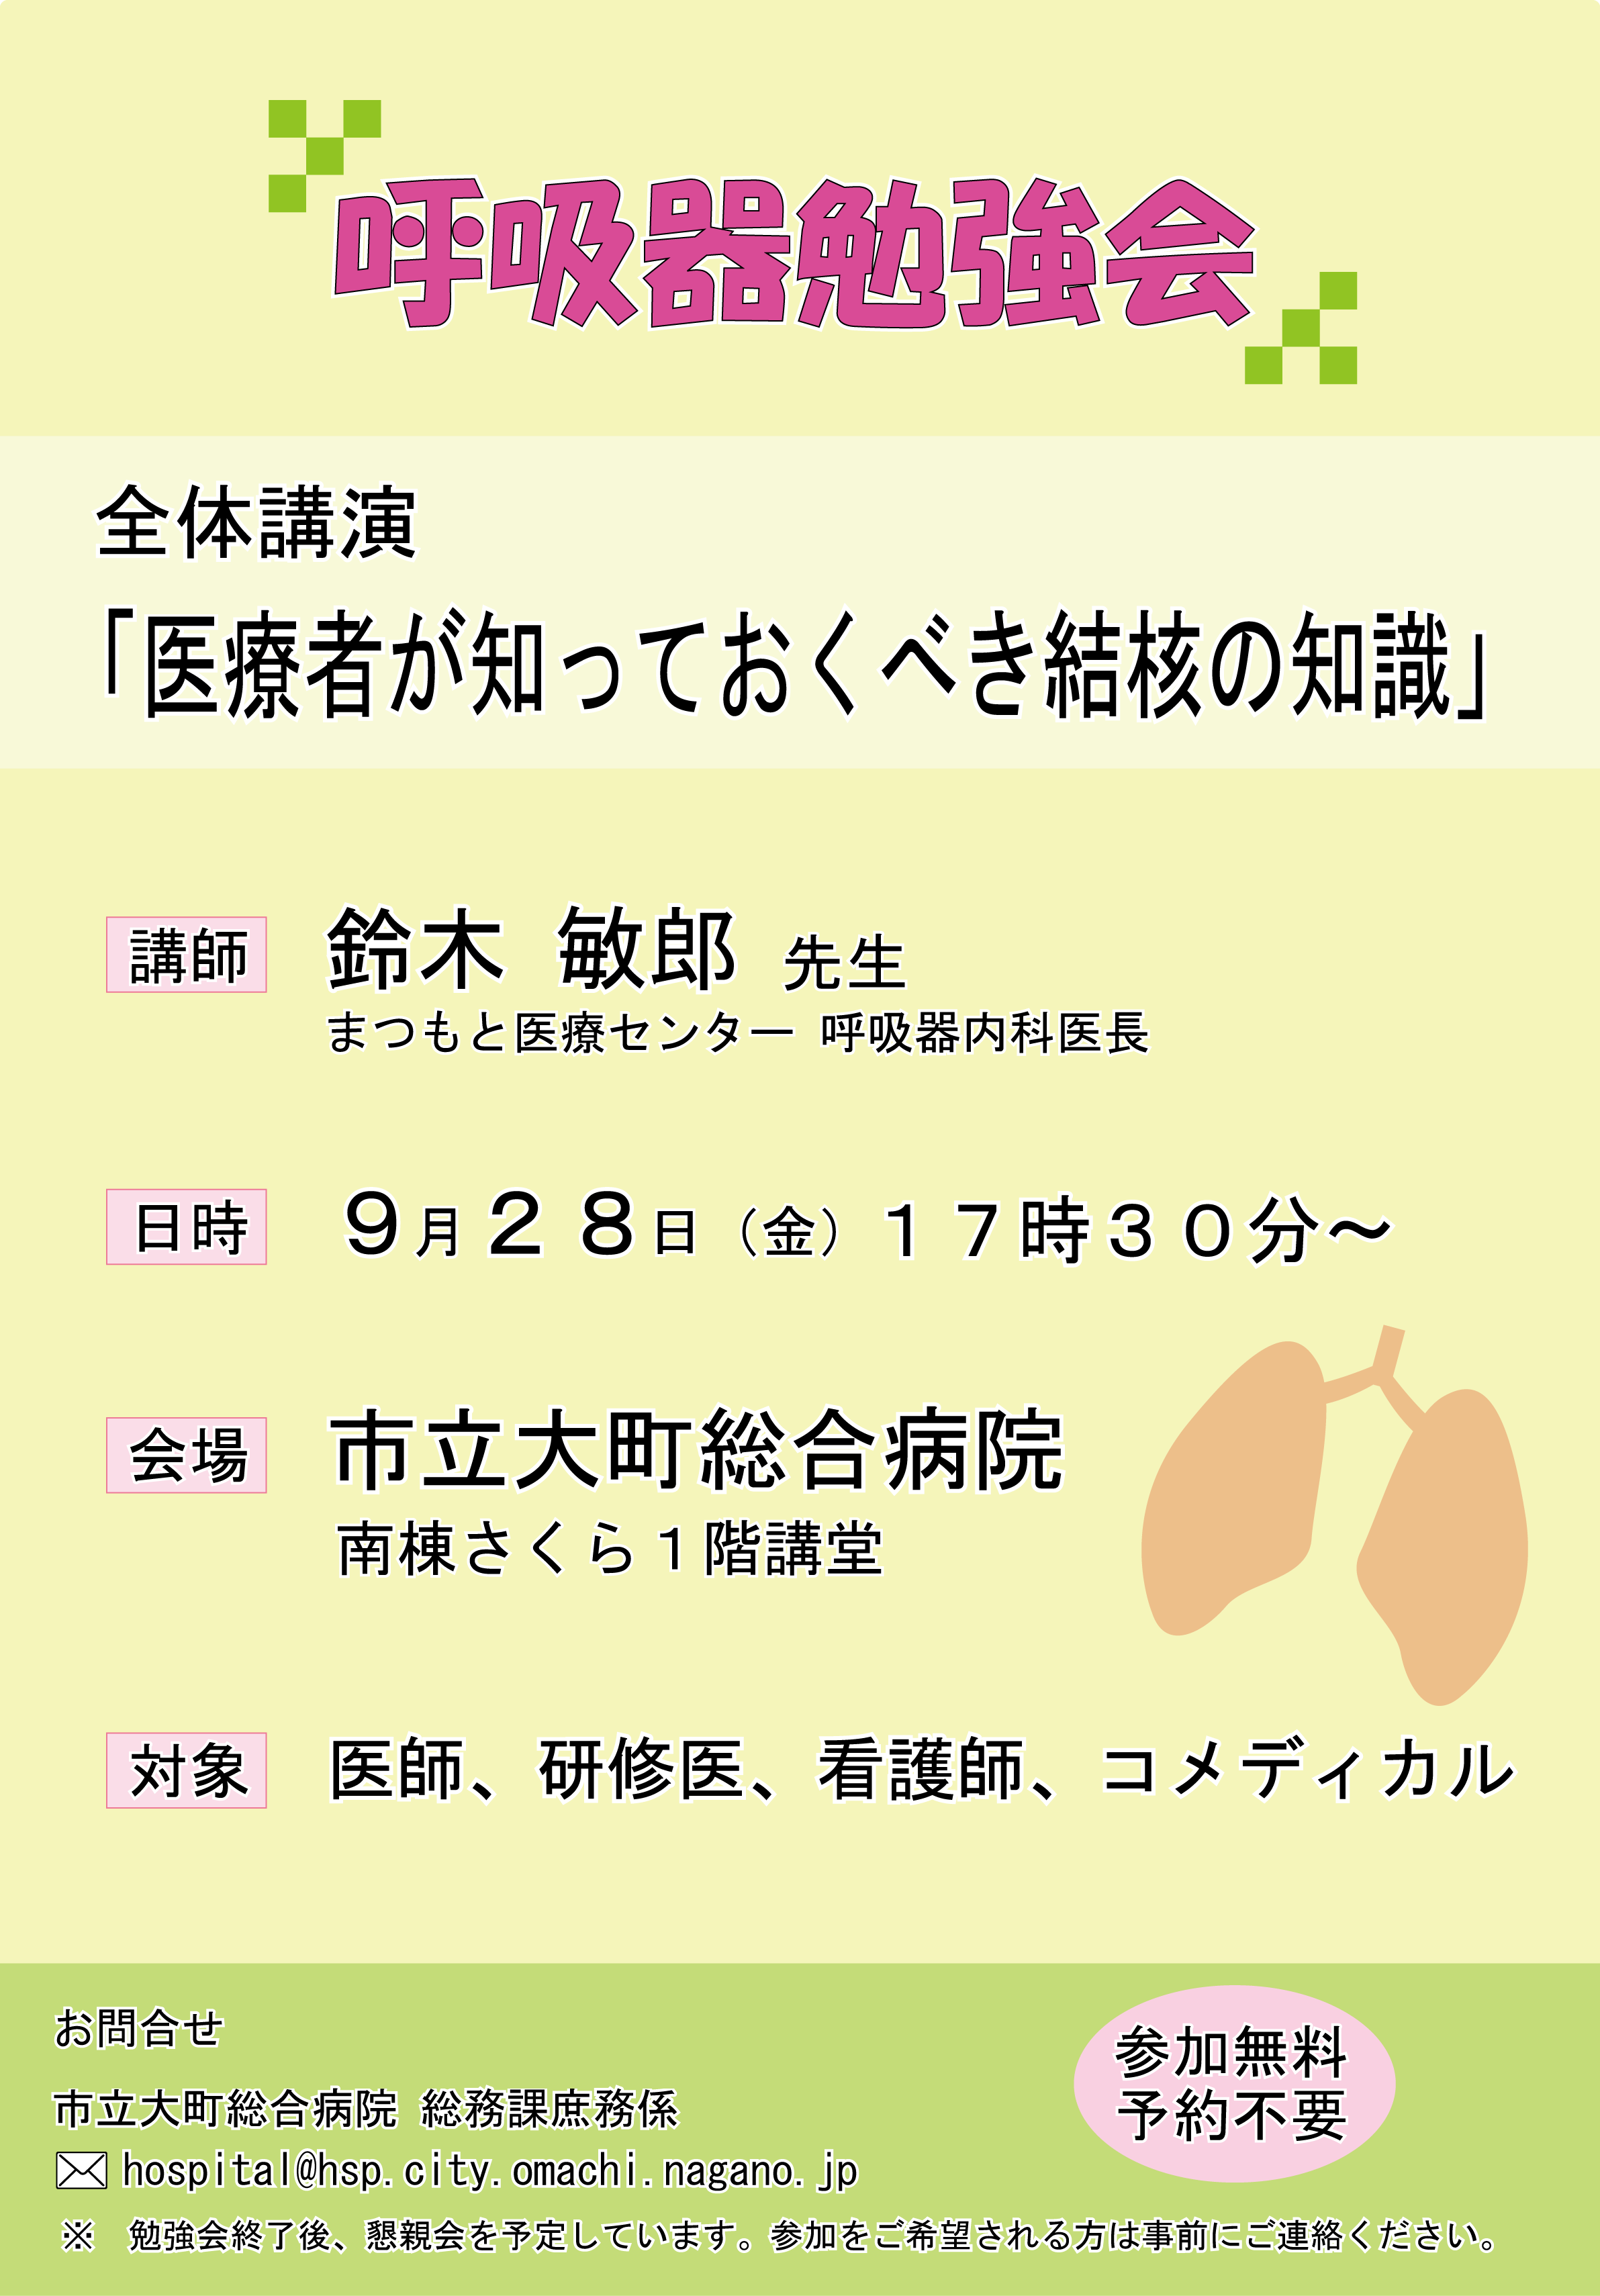 H30.9.28呼吸器勉強会